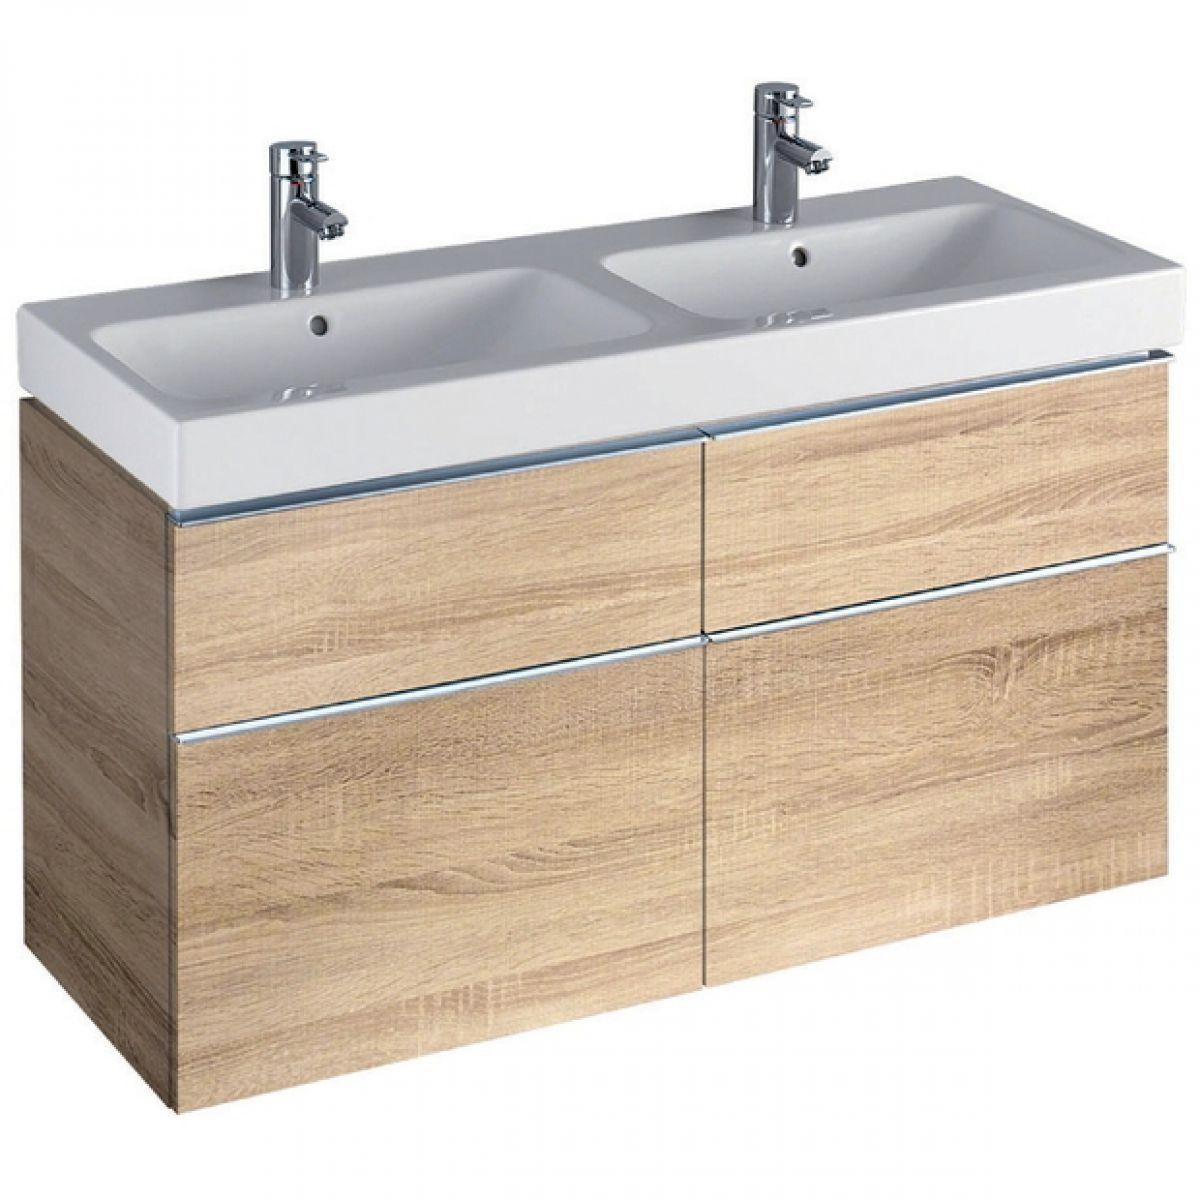 Geberit Icon 1200 Mm Vanity Unit For Double Washbasin Geberit Vanityunit Bathroom Onder Kast Wastafel Dubbele Wastafel